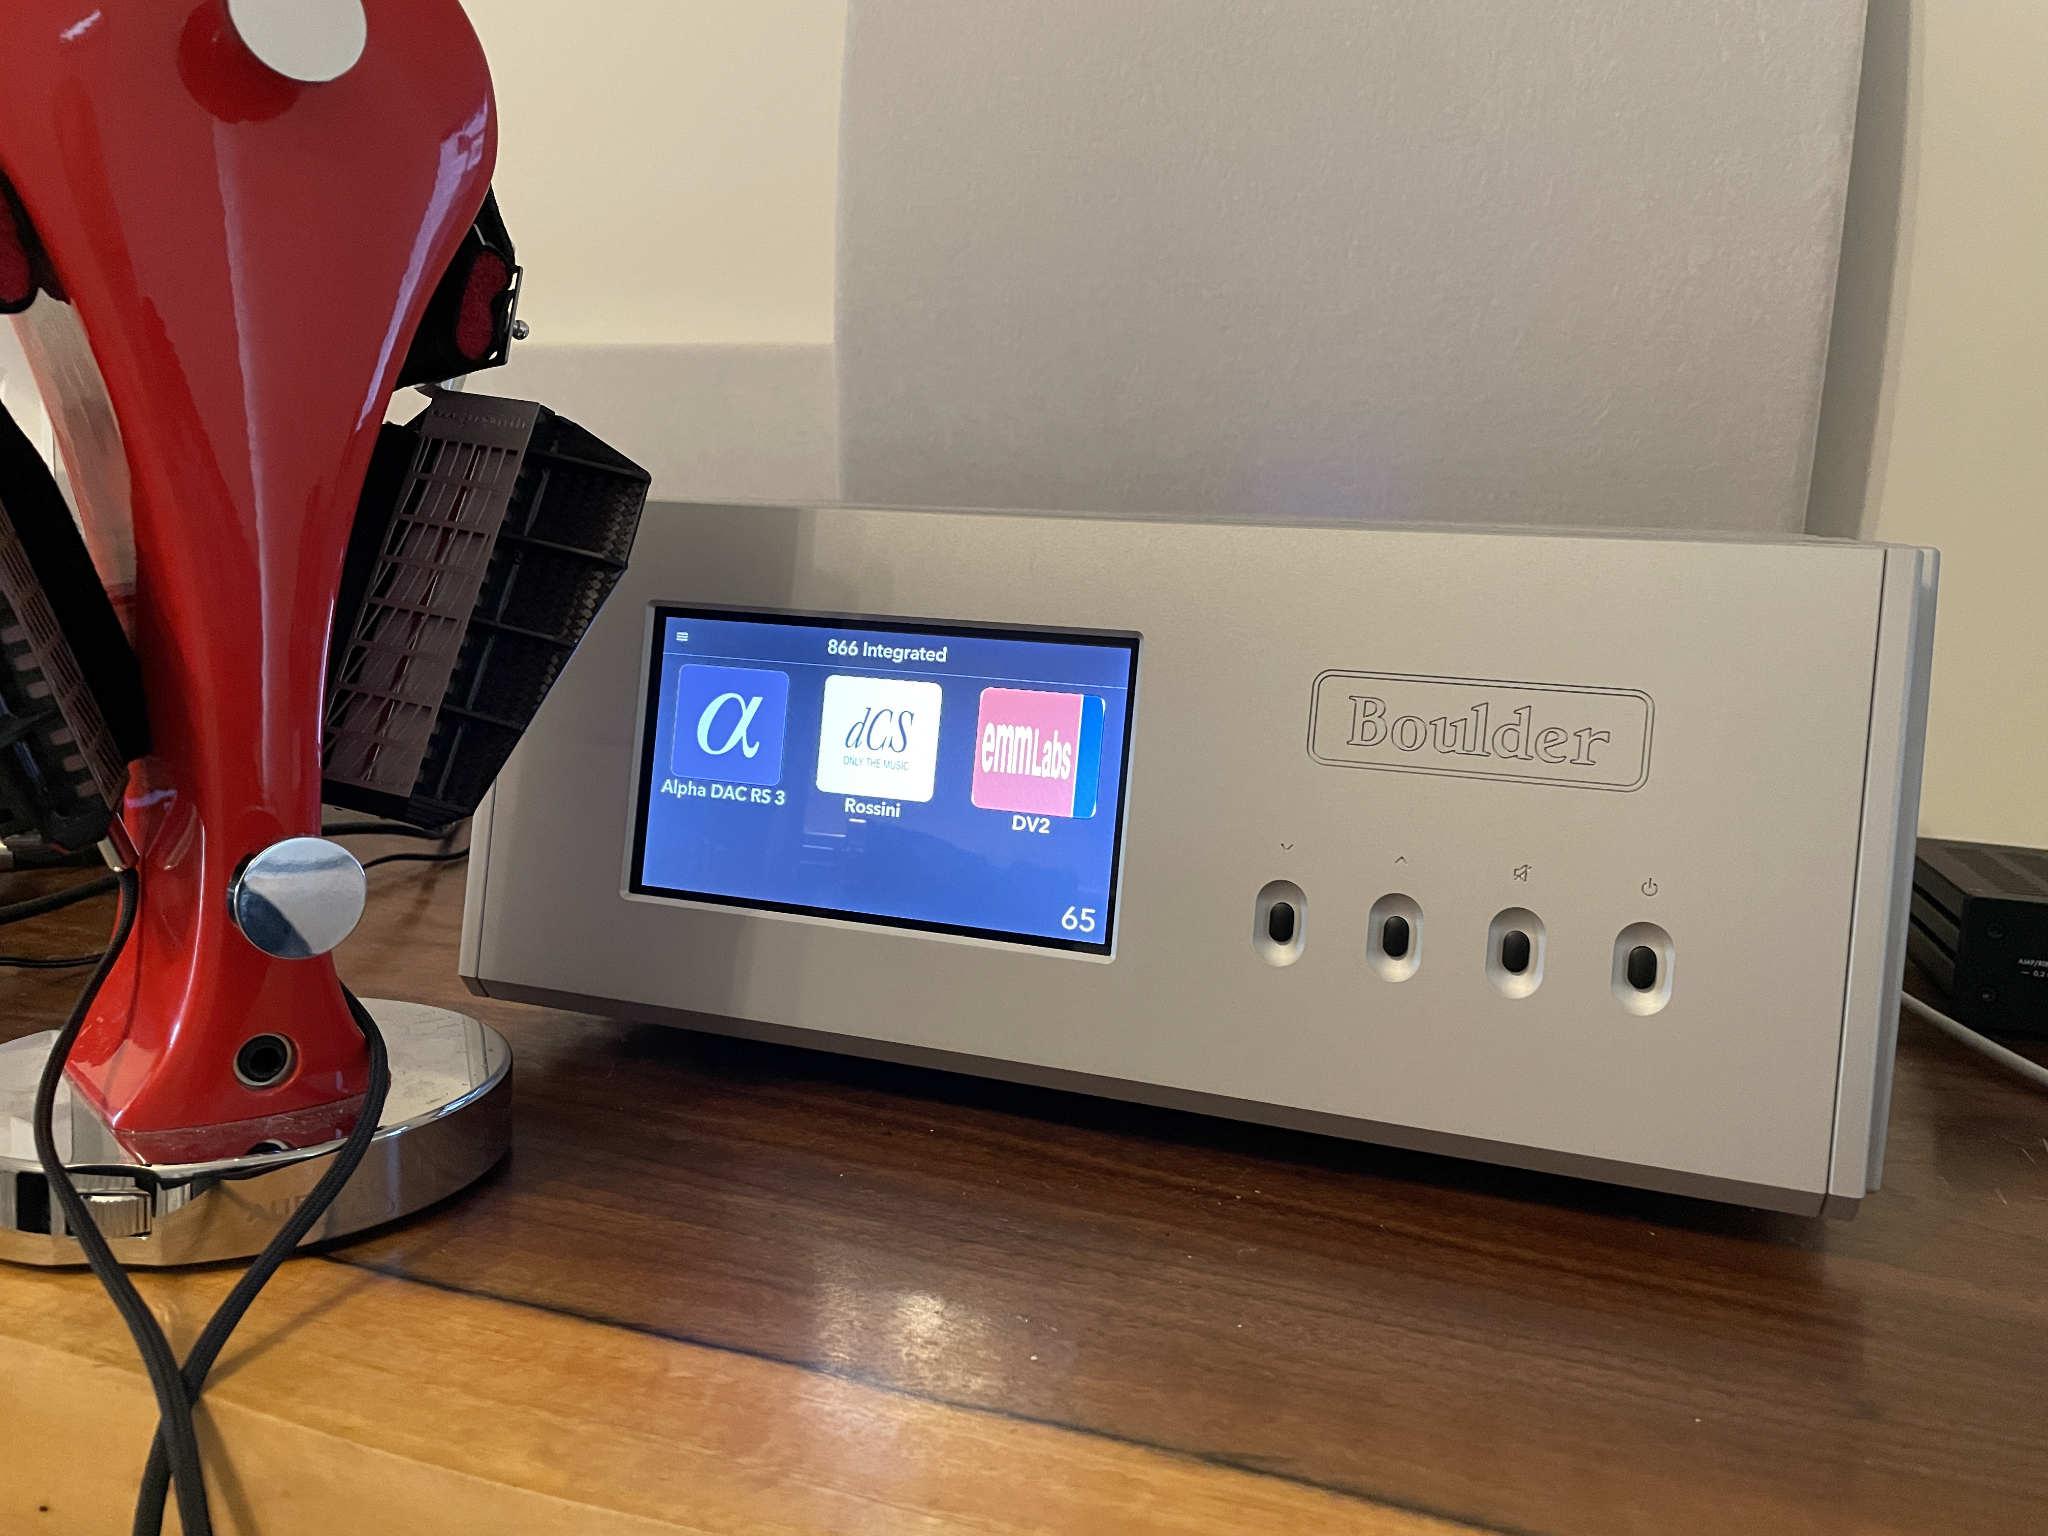 Review | Boulder 866 Integrated Amp